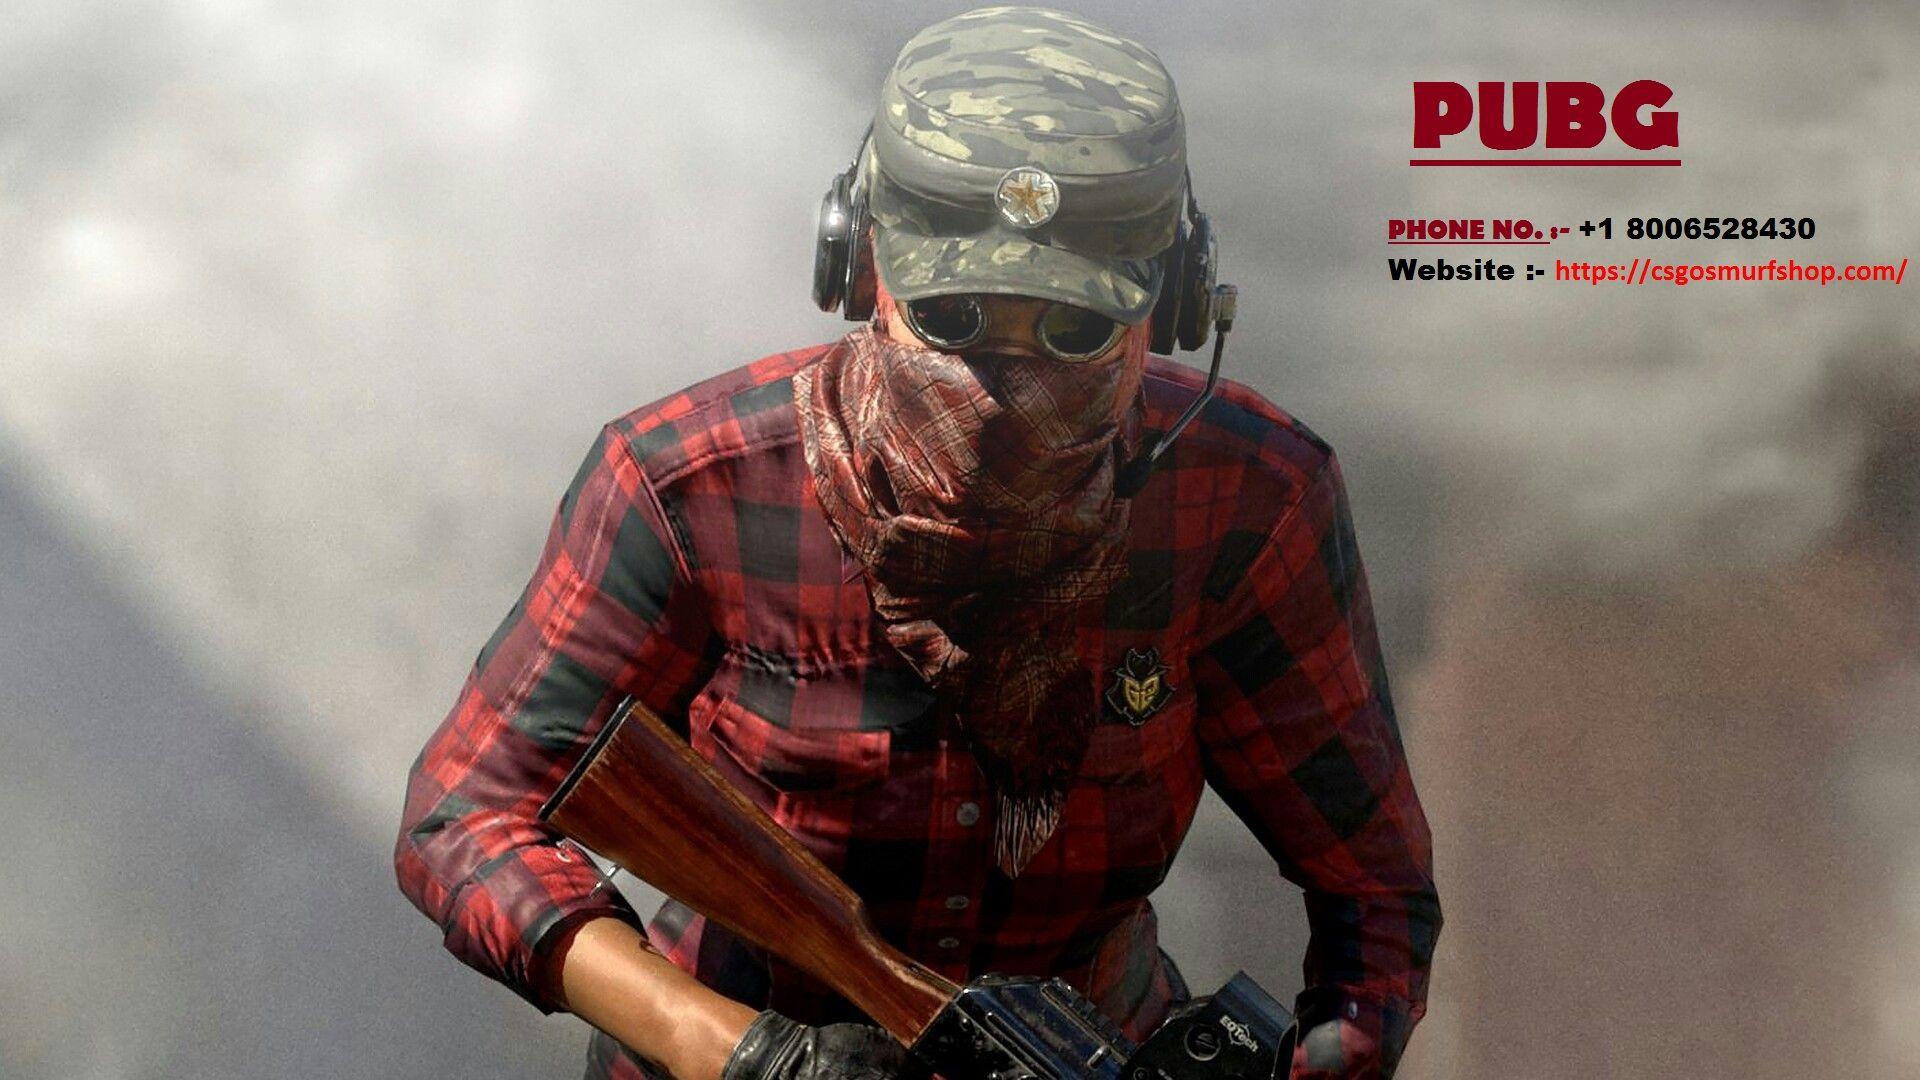 Cara Setting Grafik Hd Ultra Pubg Mobile Tanpa Lag Di: PUBG Gas Mask PlayerUnknown39s Battlegrounds 4K Wallpaper